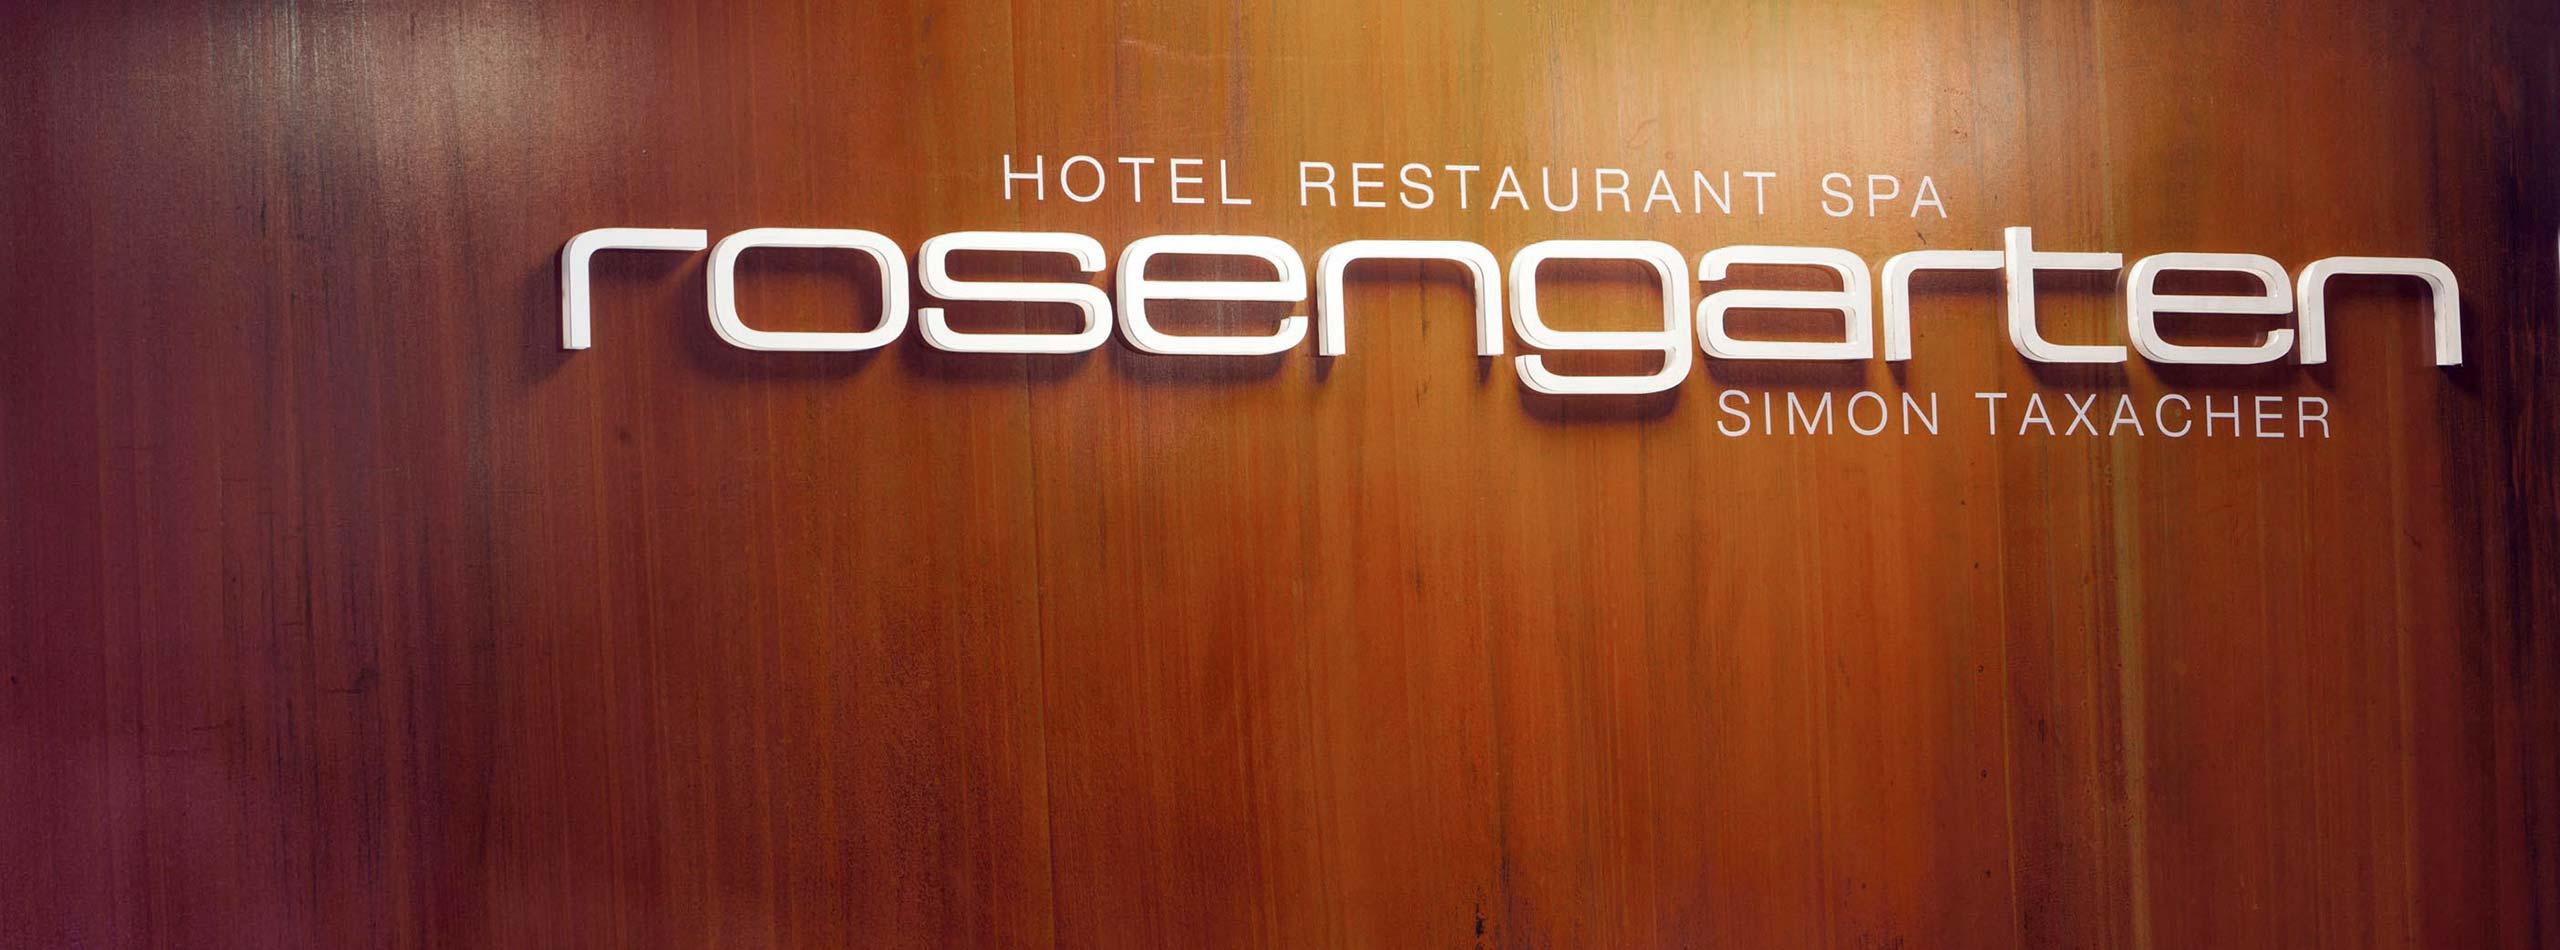 5 Sterne Hotel Restaurant Spa Rosengarten Impressum